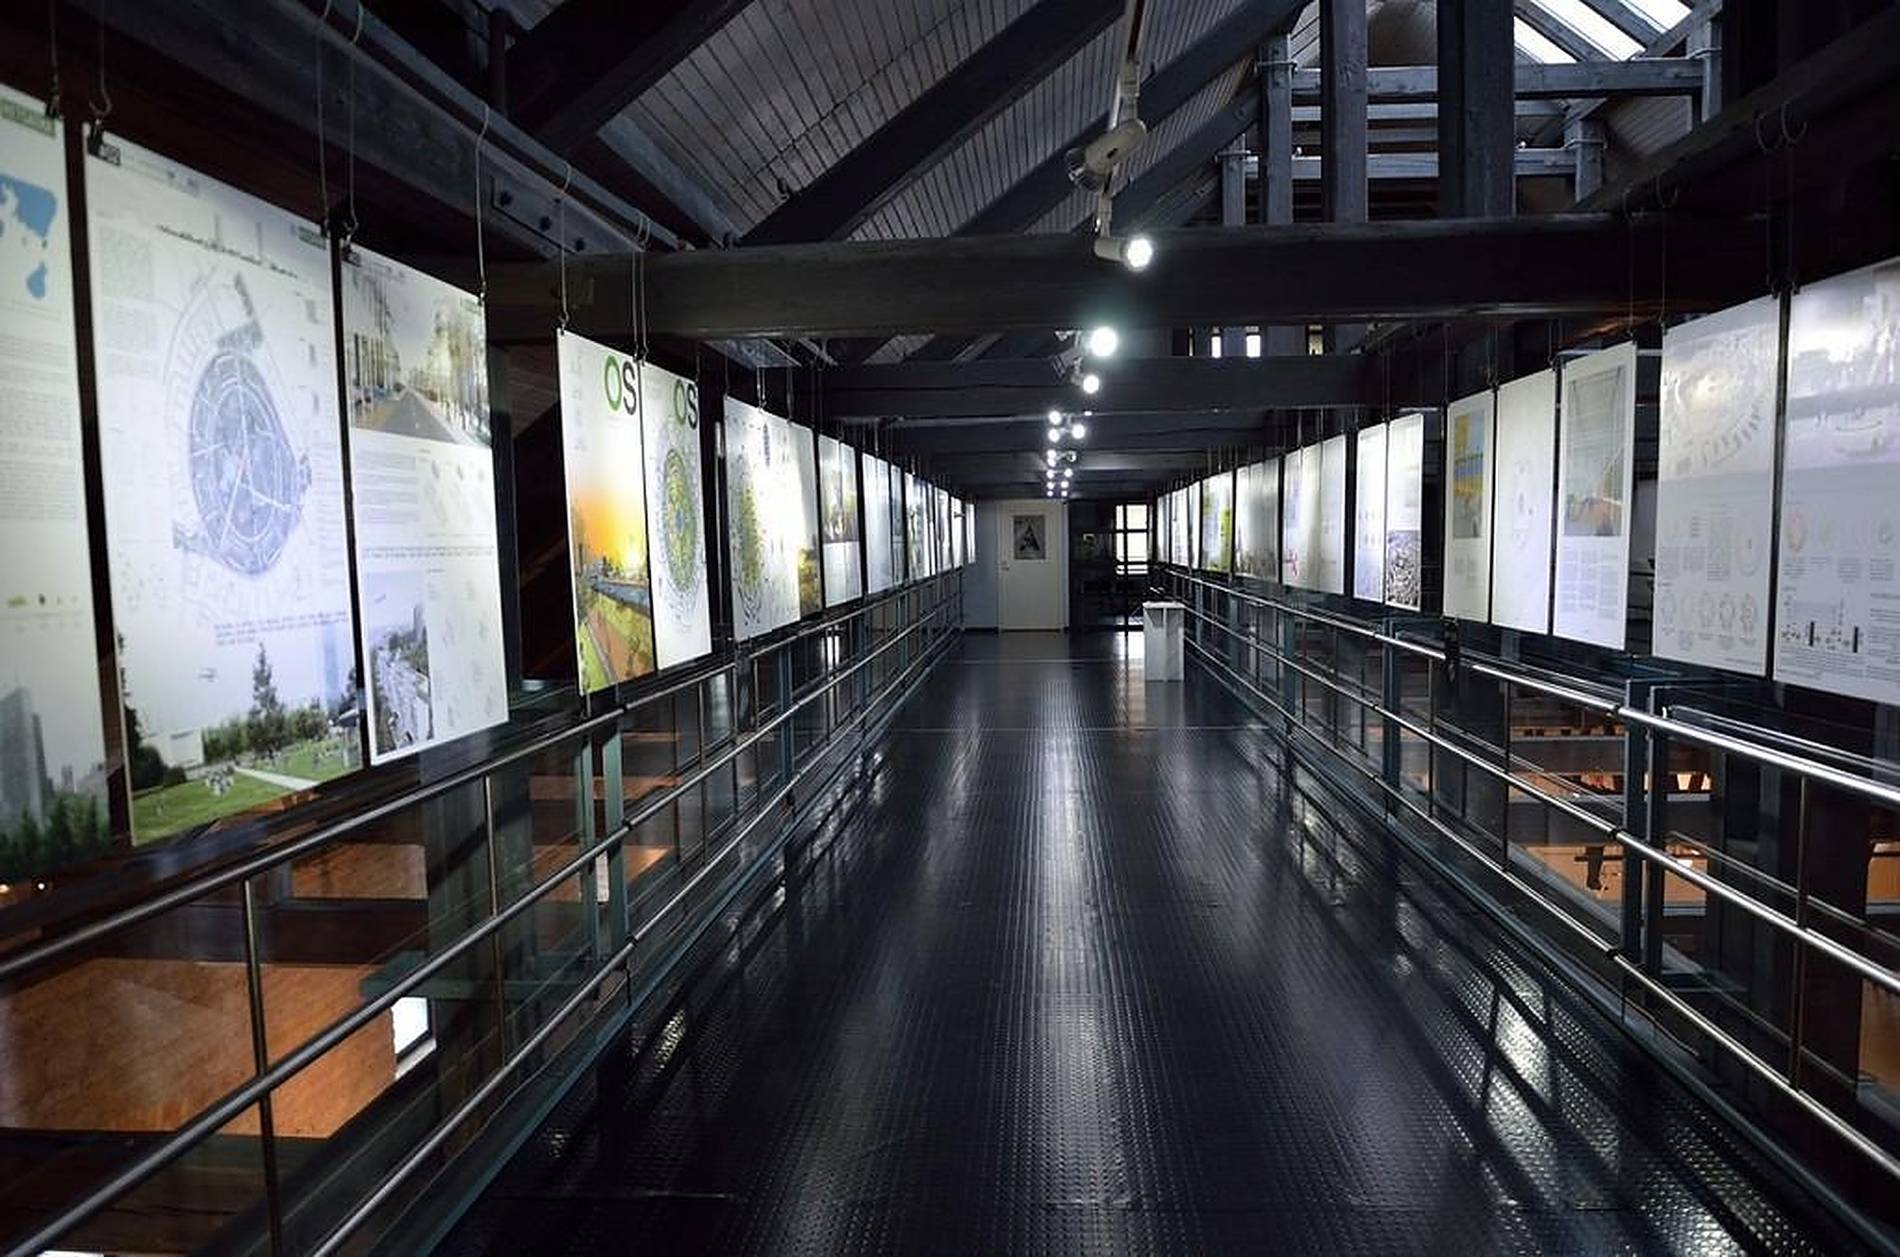 Museum of Estonian Architecture in Tallinn, Estonia